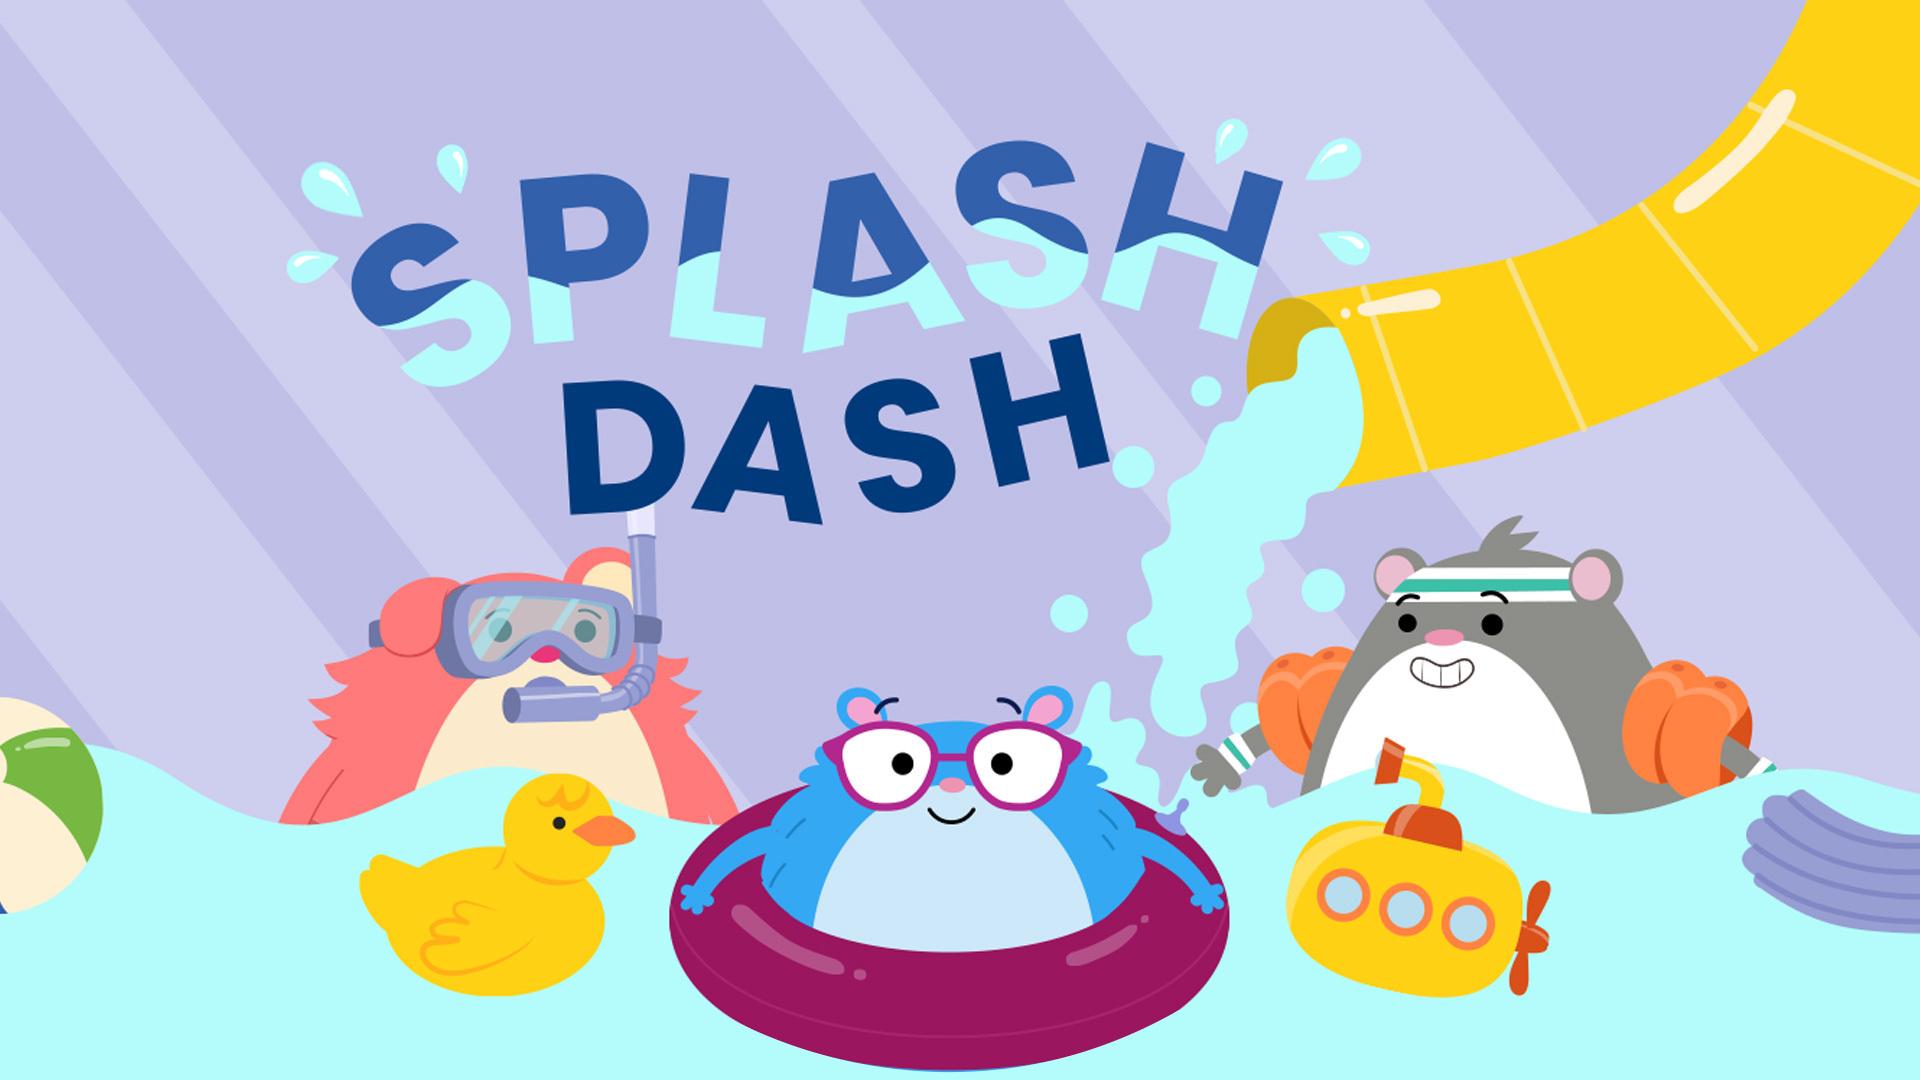 Splash Dash game